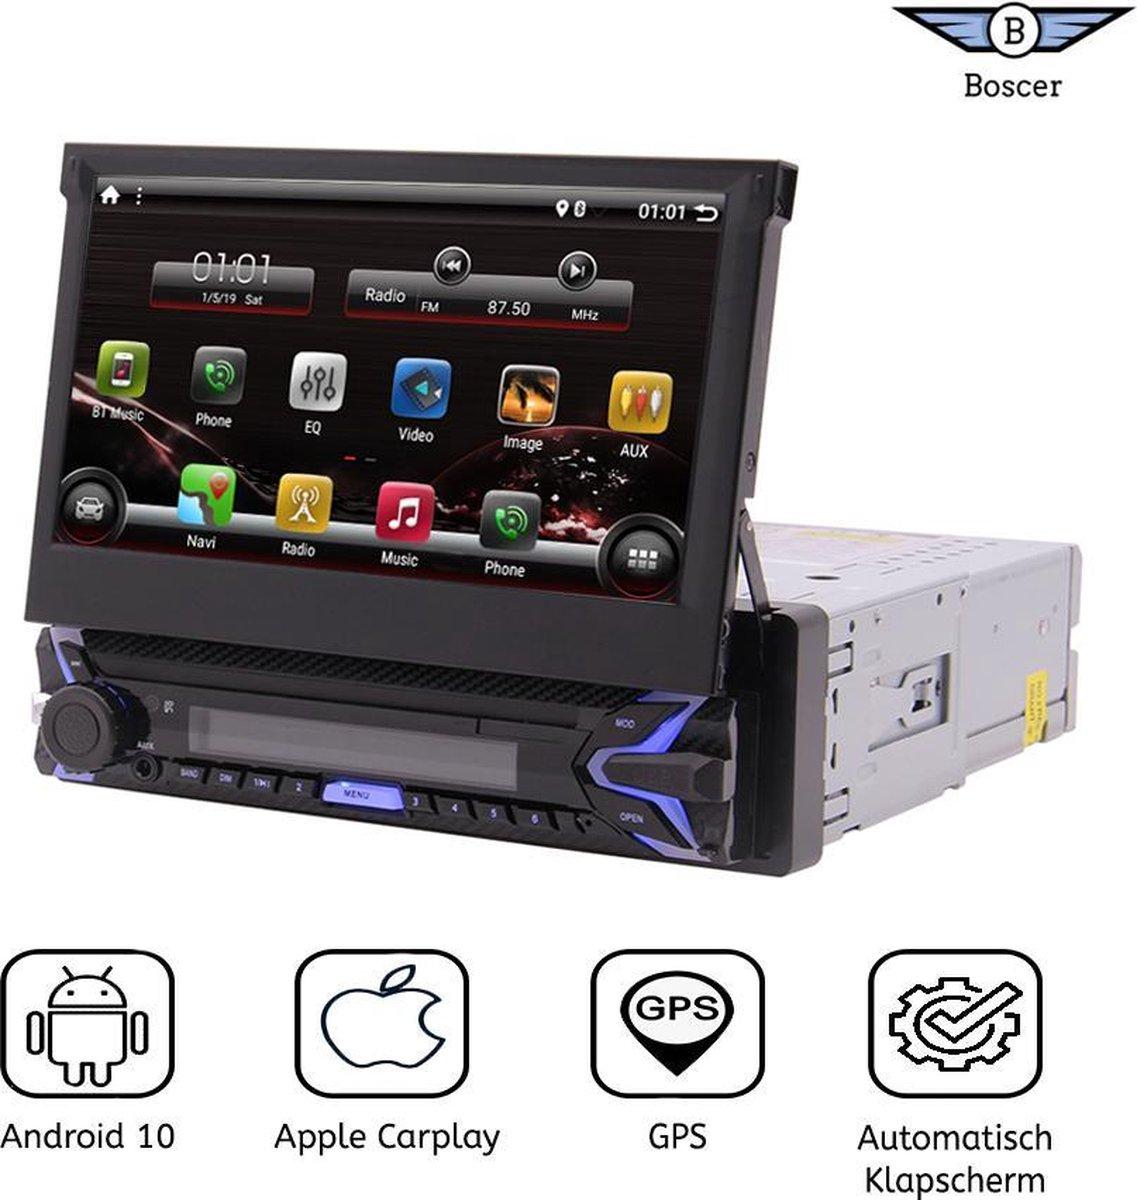 Boscer® 1Din Autoradio   Android 10   7' HD Automatisch Klapscherm   Apple Carplay & Android Auto   Navigatiesysteem   Motor Klapscherm   USB, Aux, Bluetooth, WIFI   Achteruitrijcamera